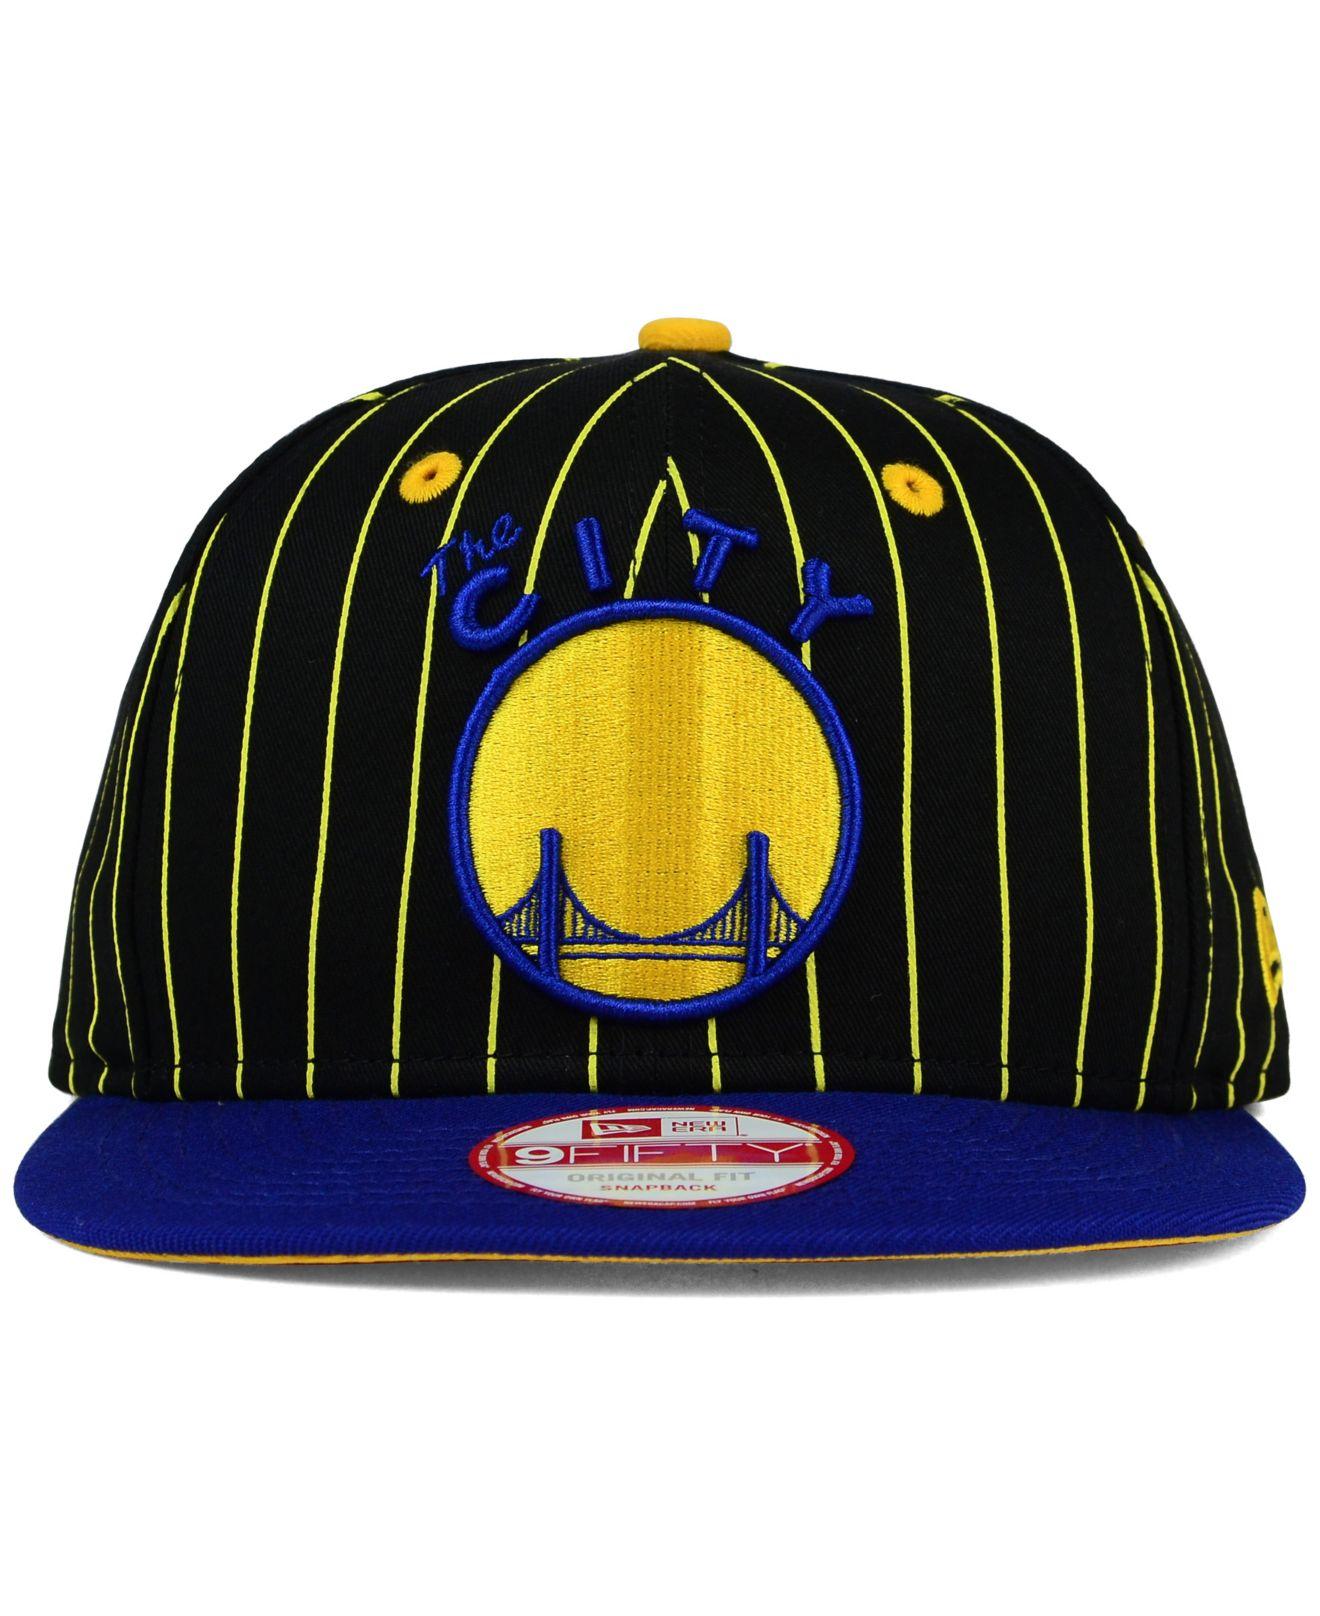 brand new 426fd c8620 KTZ Golden State Warriors Vintage Pinstripe 9fifty Snapback Cap in ...